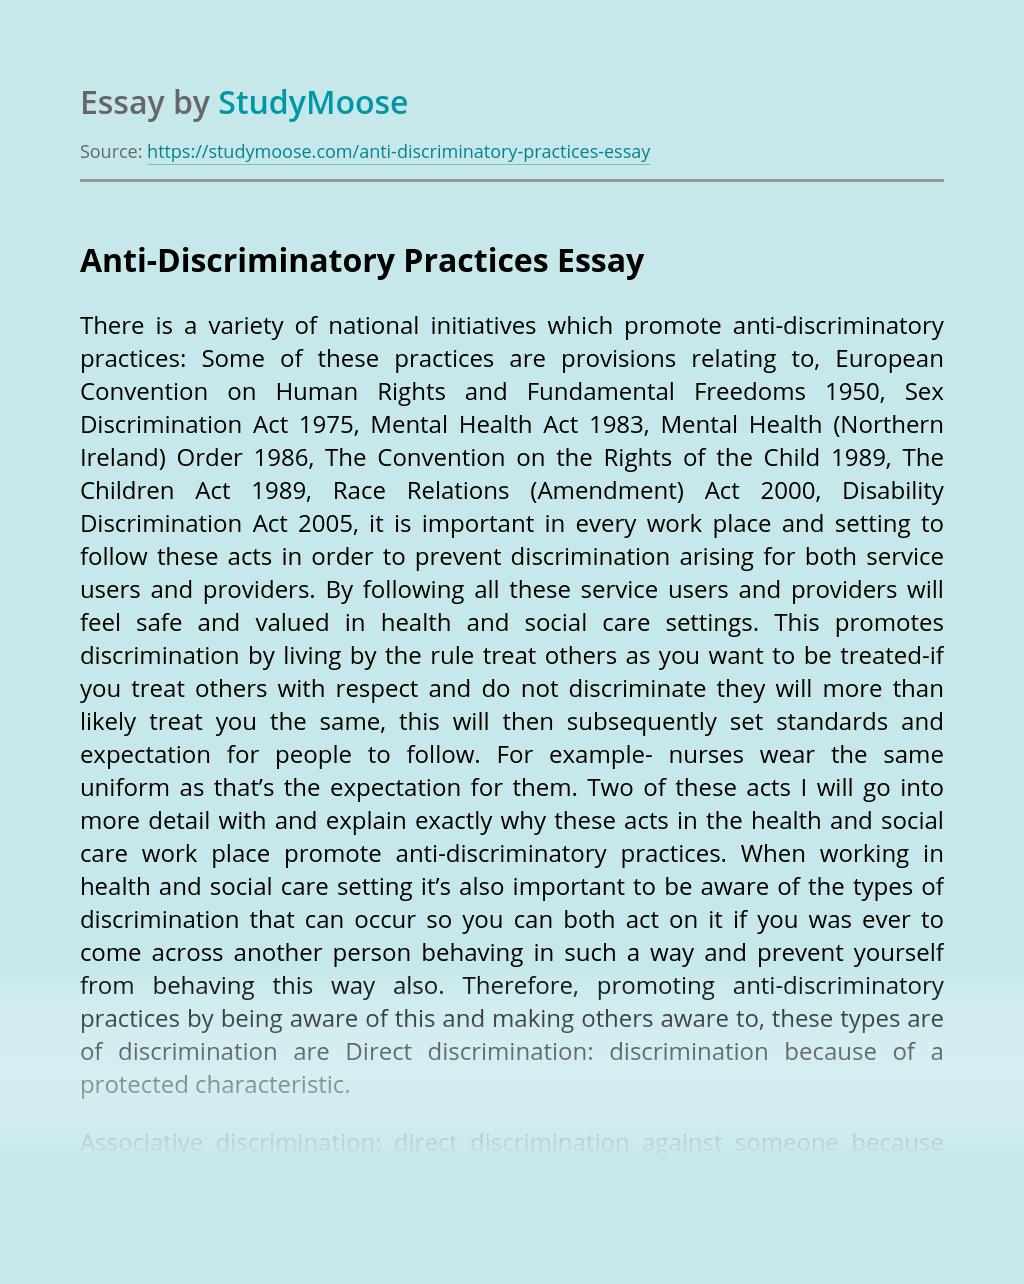 Anti-Discriminatory Practices